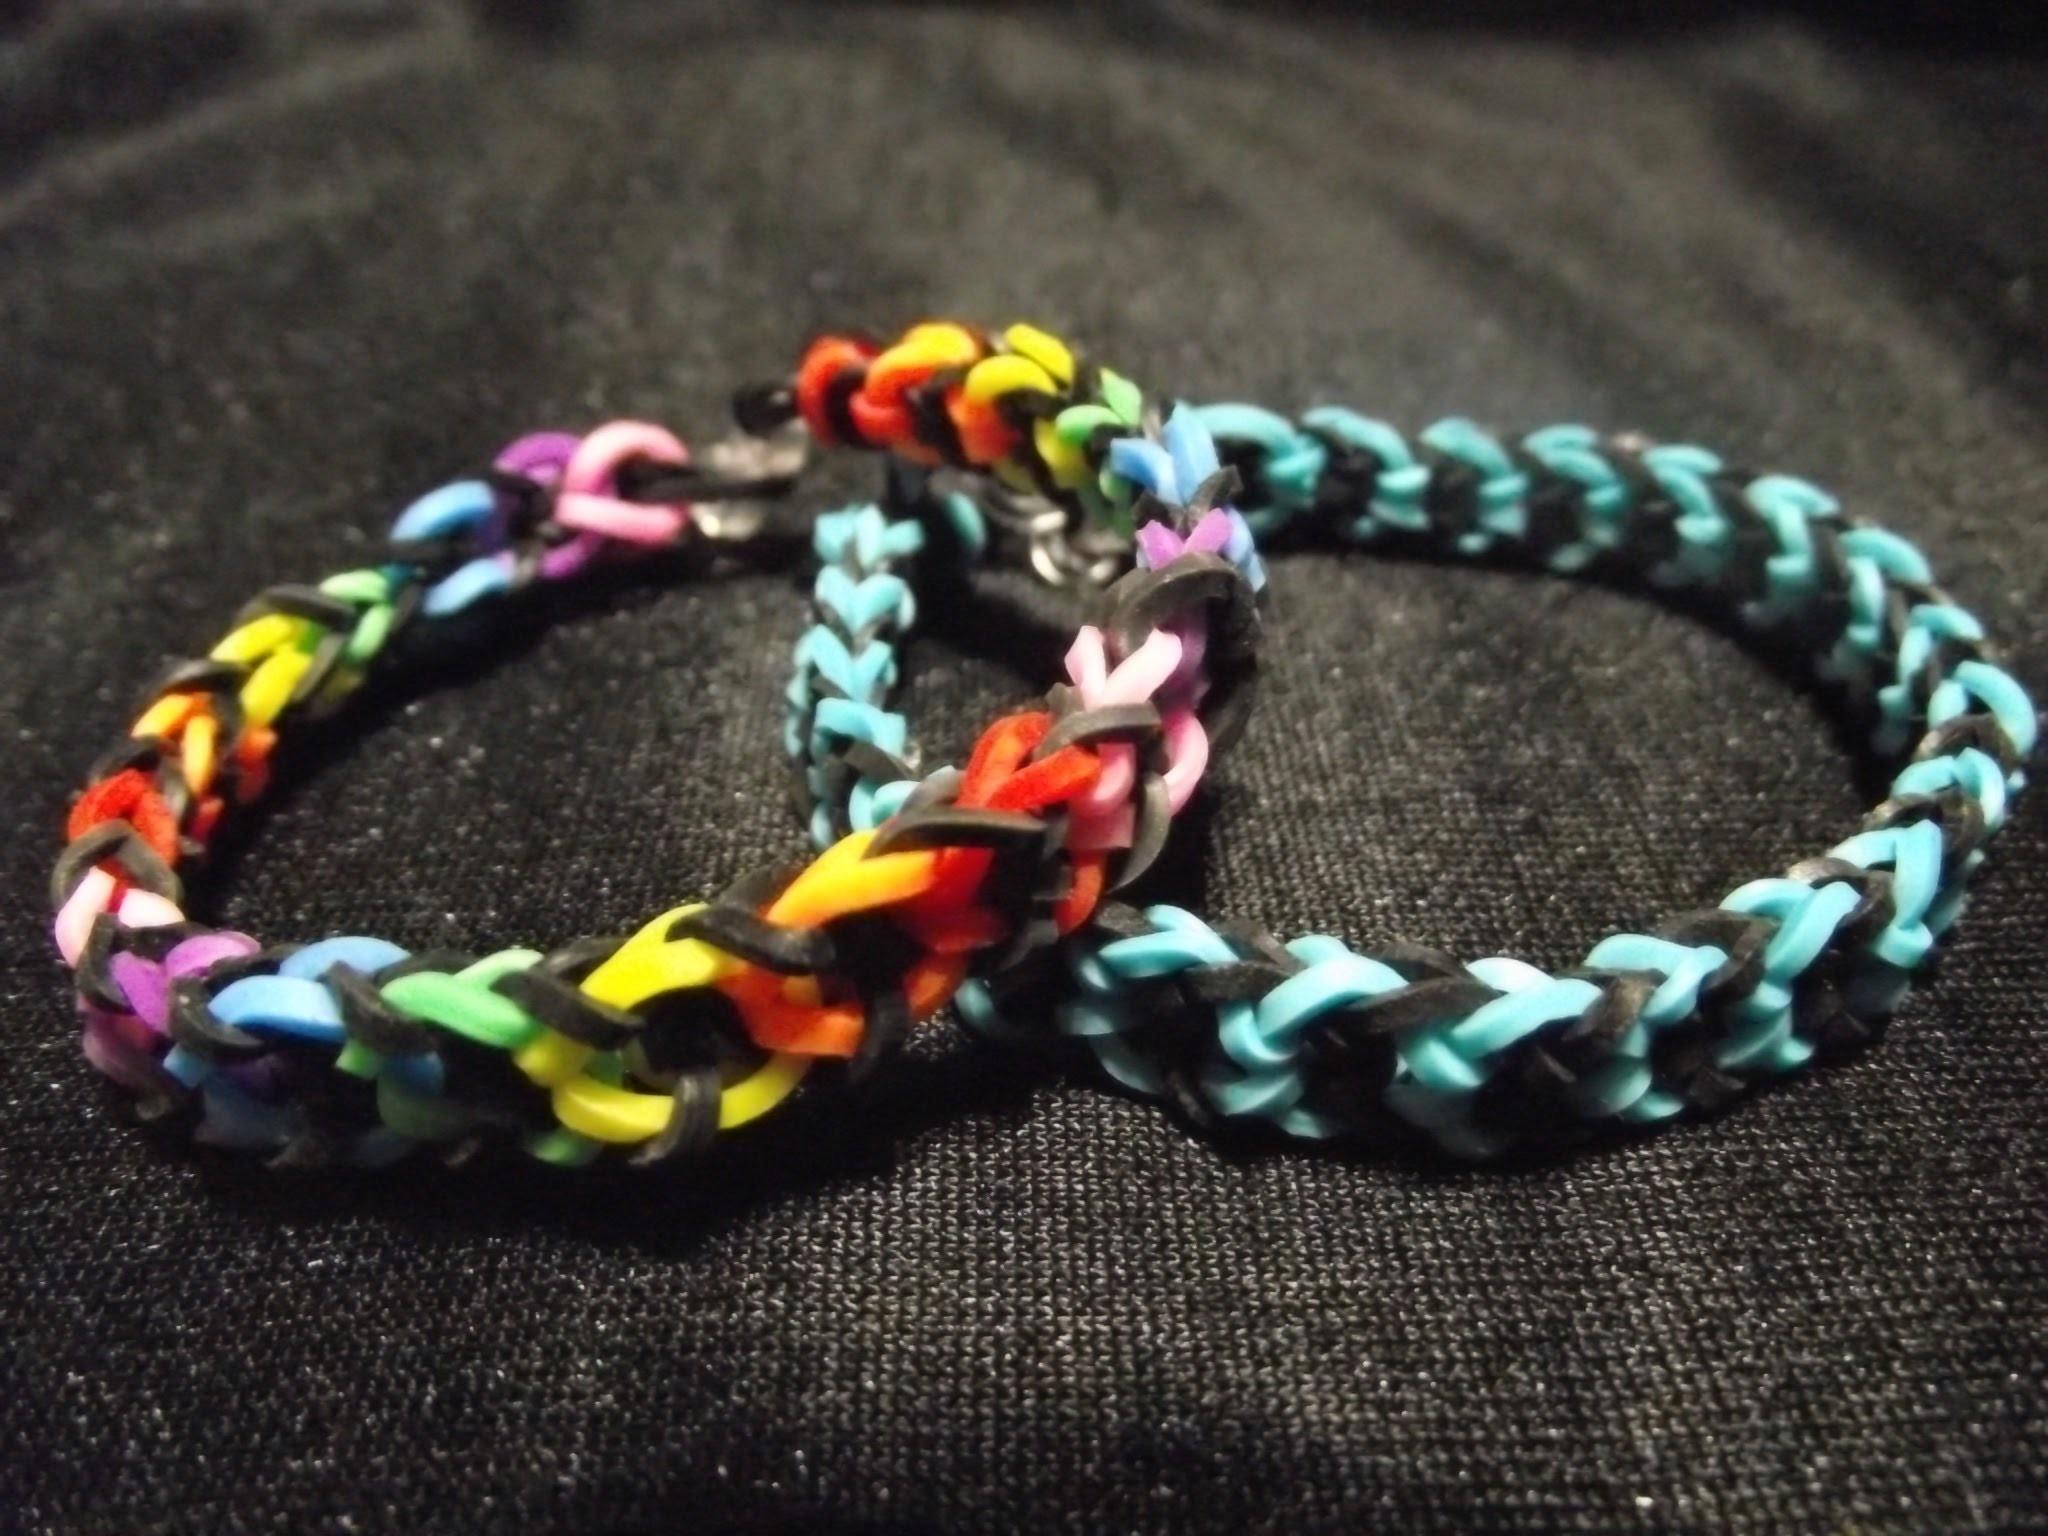 Rainbow loom bands. Le bracelet elastique mistigri (francais)